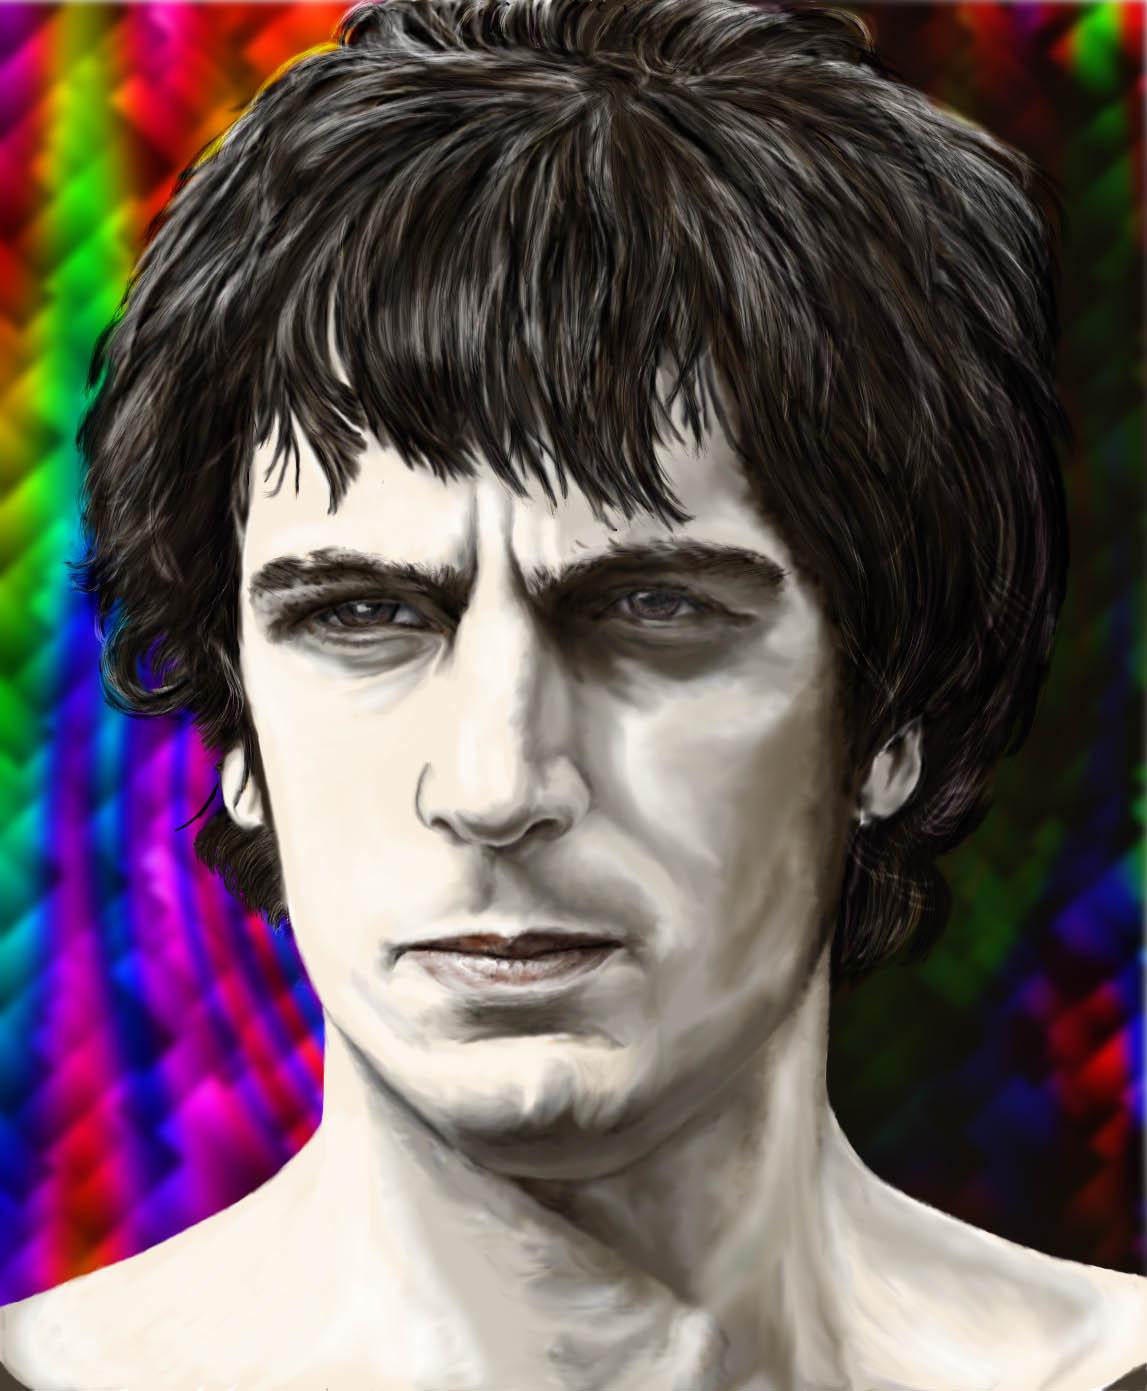 L'infanzia di Syd Barrett, il fondatore dei Pink Floyd